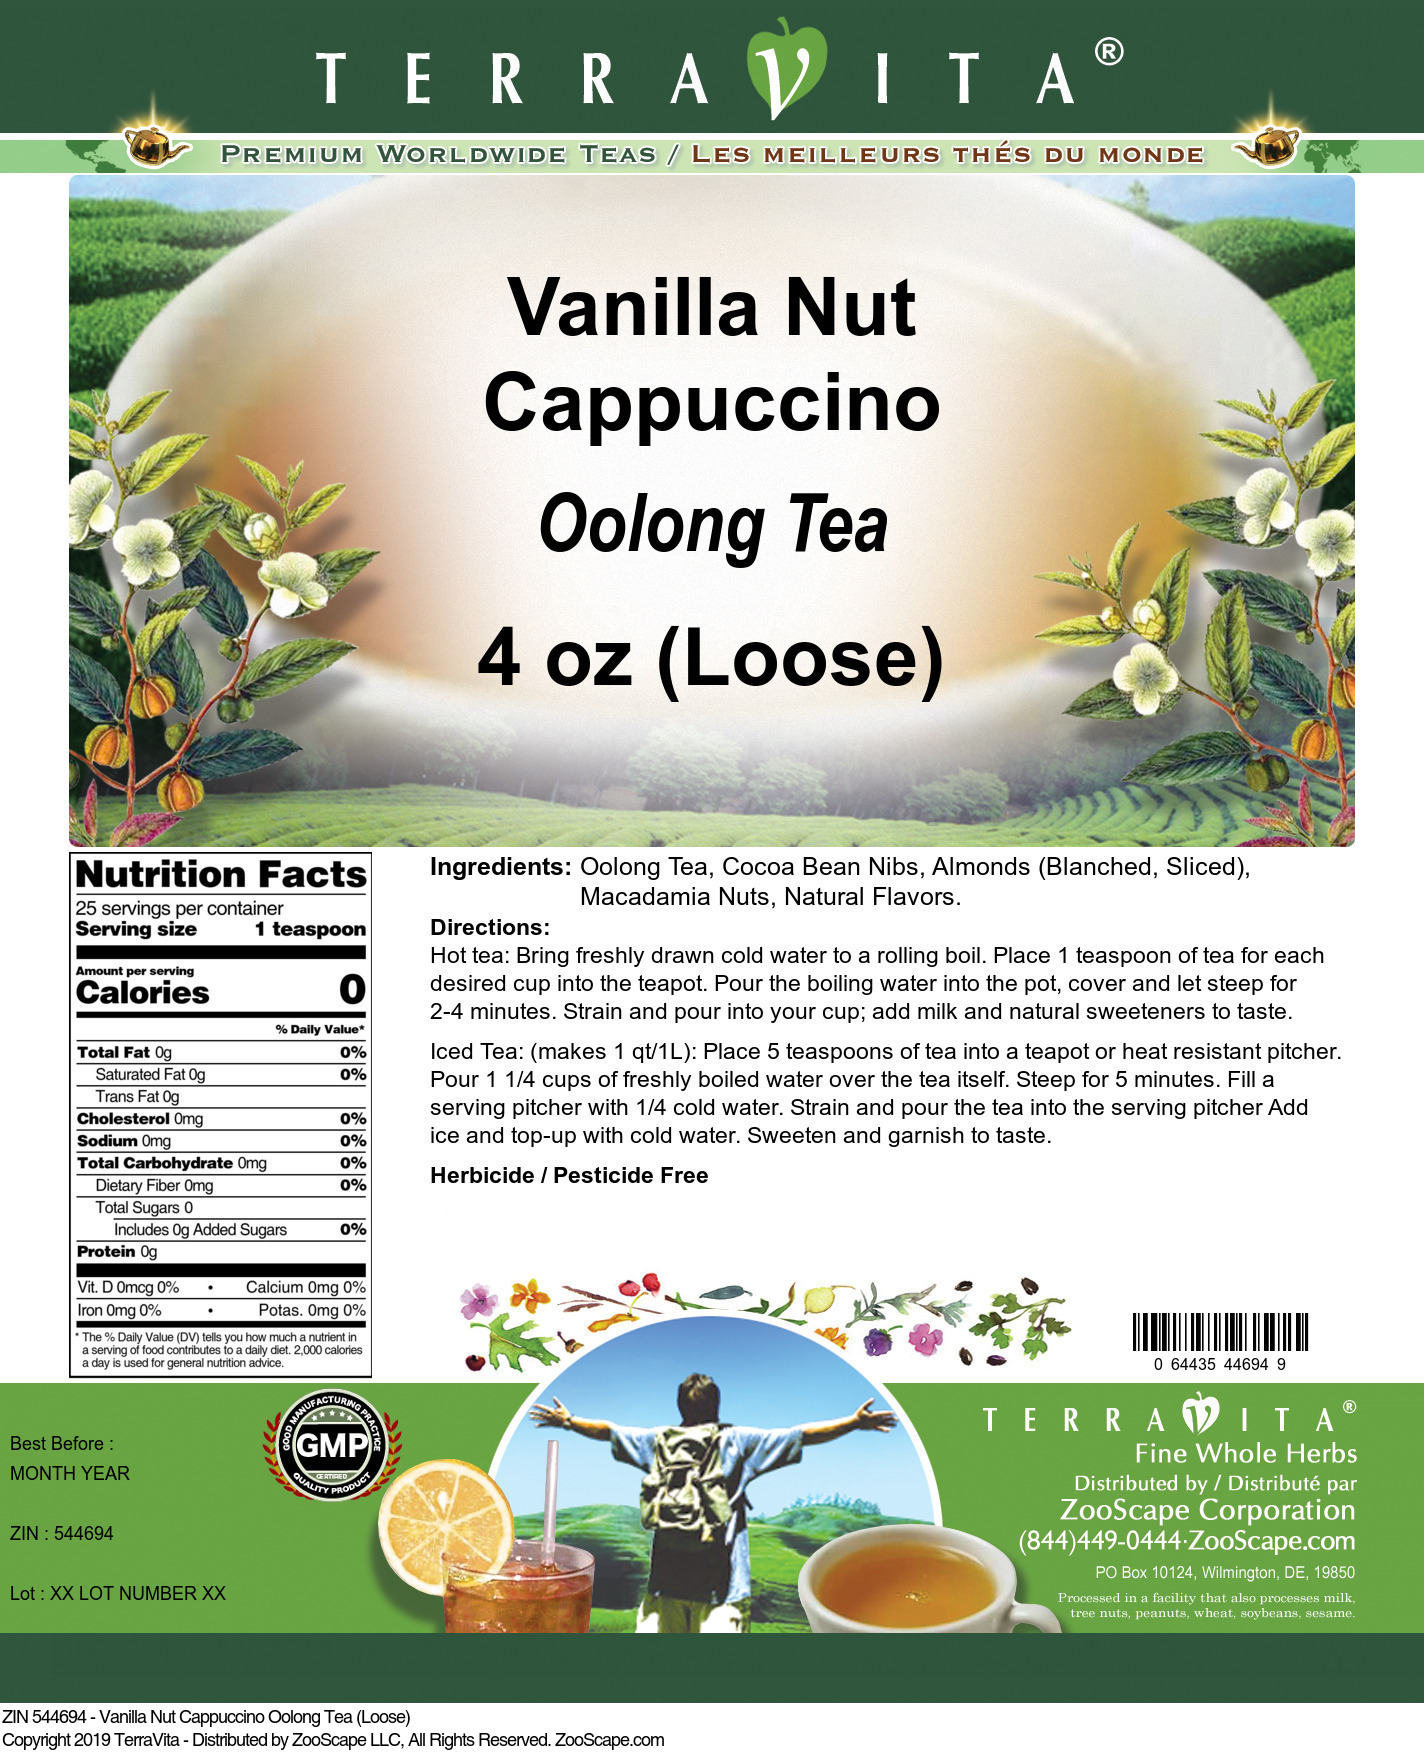 Vanilla Nut Cappuccino Oolong Tea (Loose)